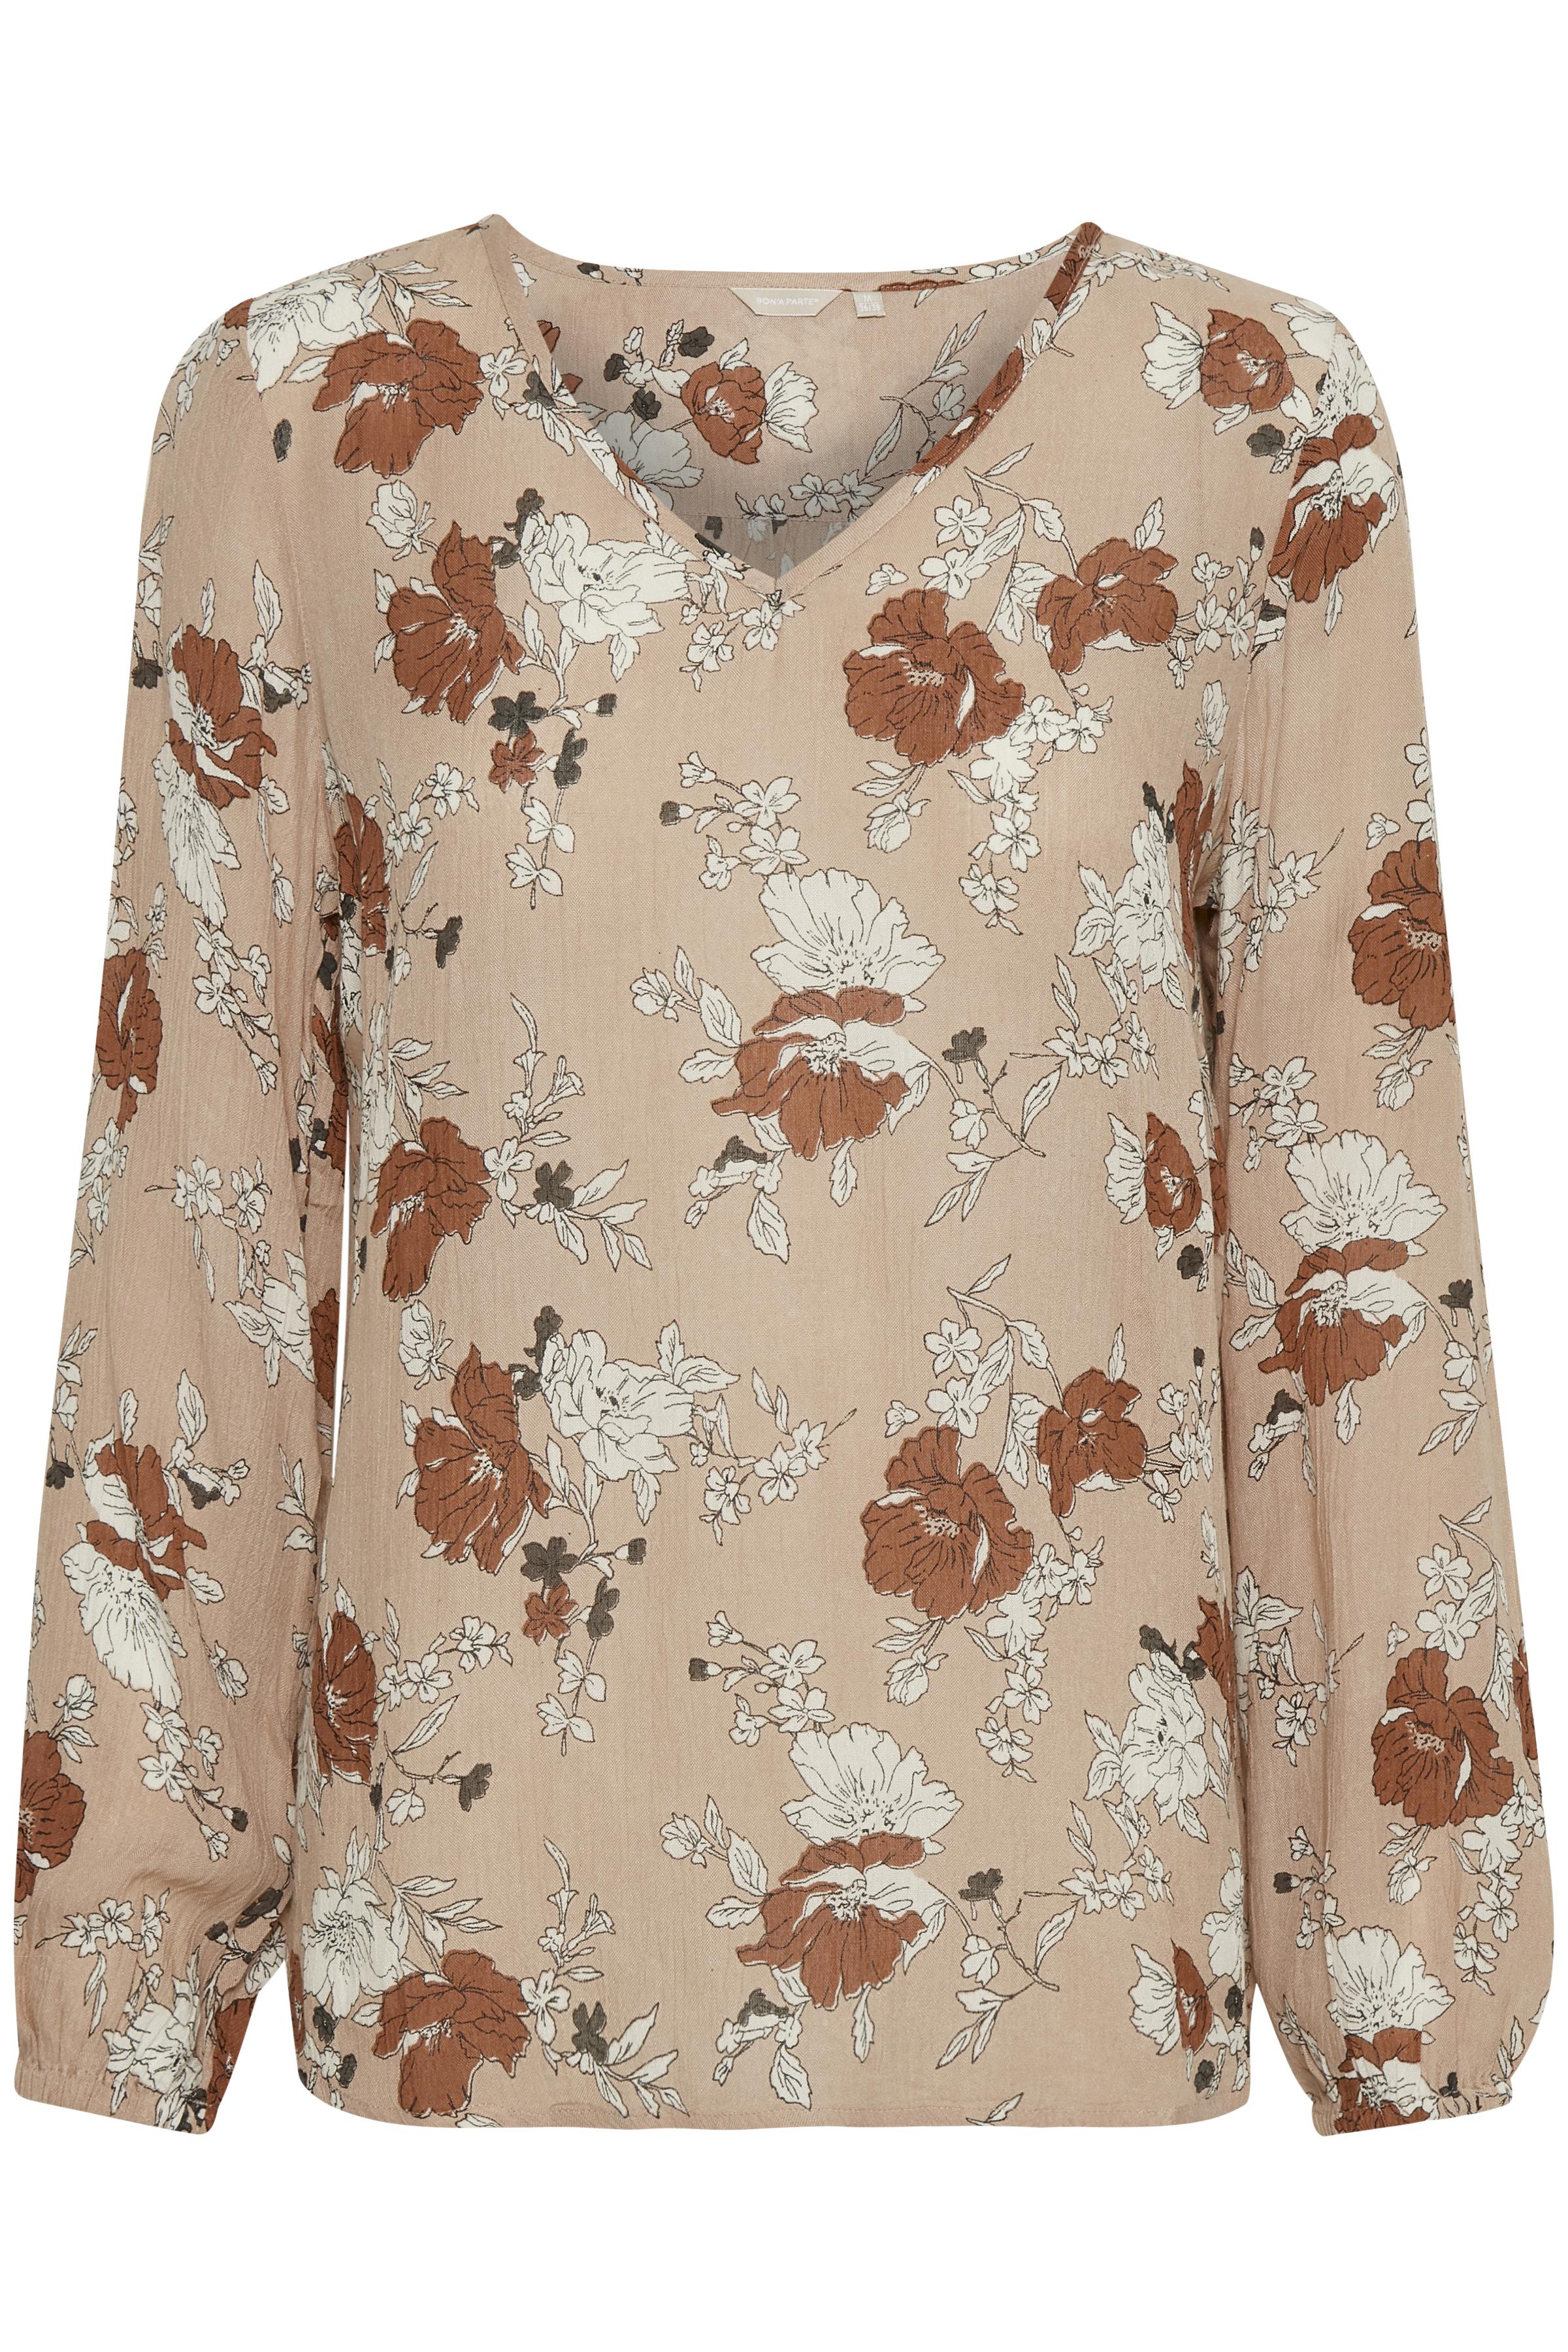 Staubrosa Langarm-Bluse von Bon'A Parte – Shoppen SieStaubrosa Langarm-Bluse ab Gr. S-2XL hier